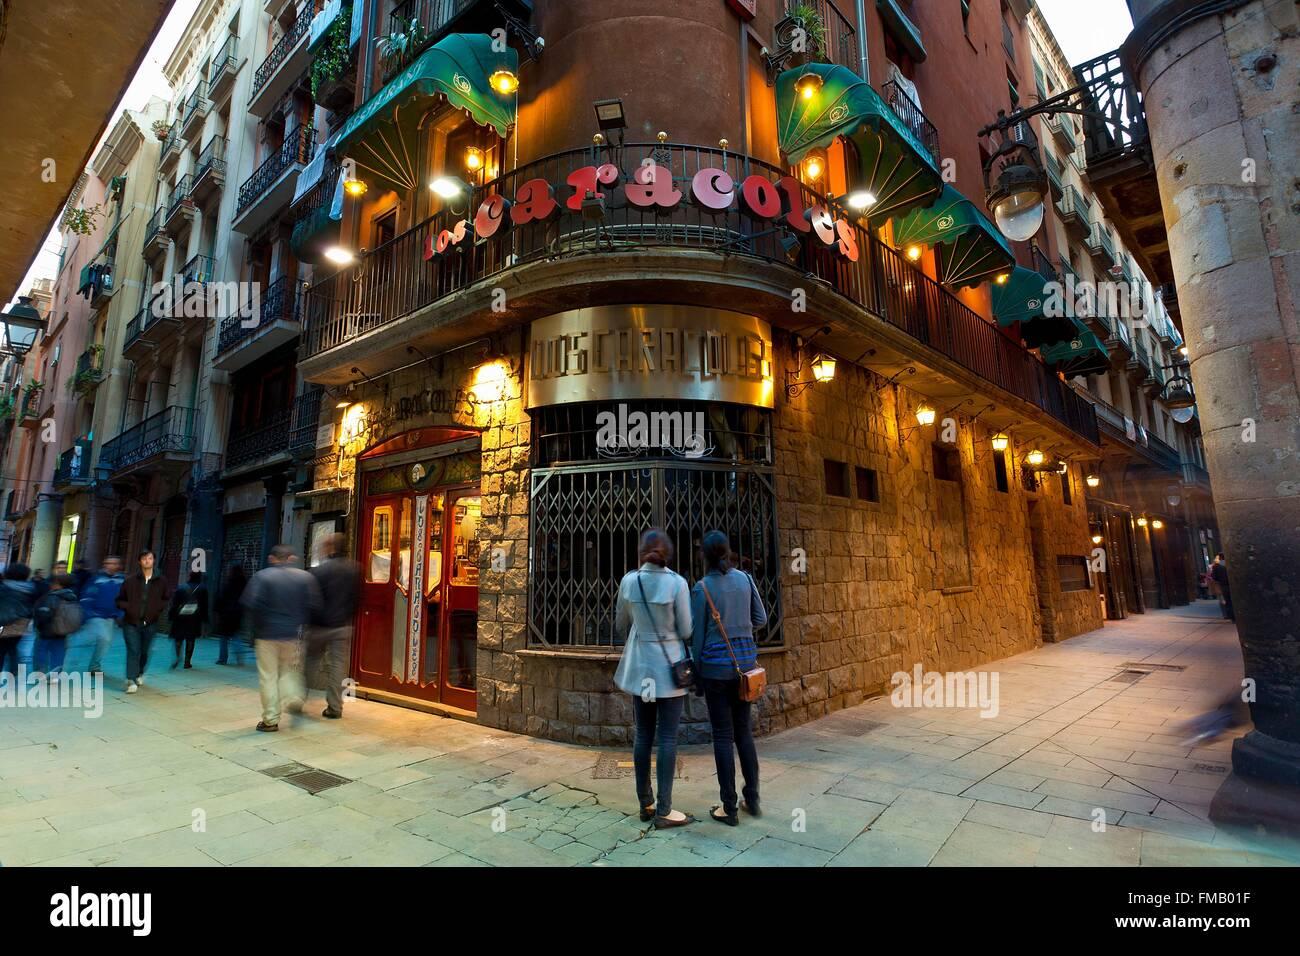 Spain, Catalonia, Barcelona, Barcelona 's street by night - Stock Image